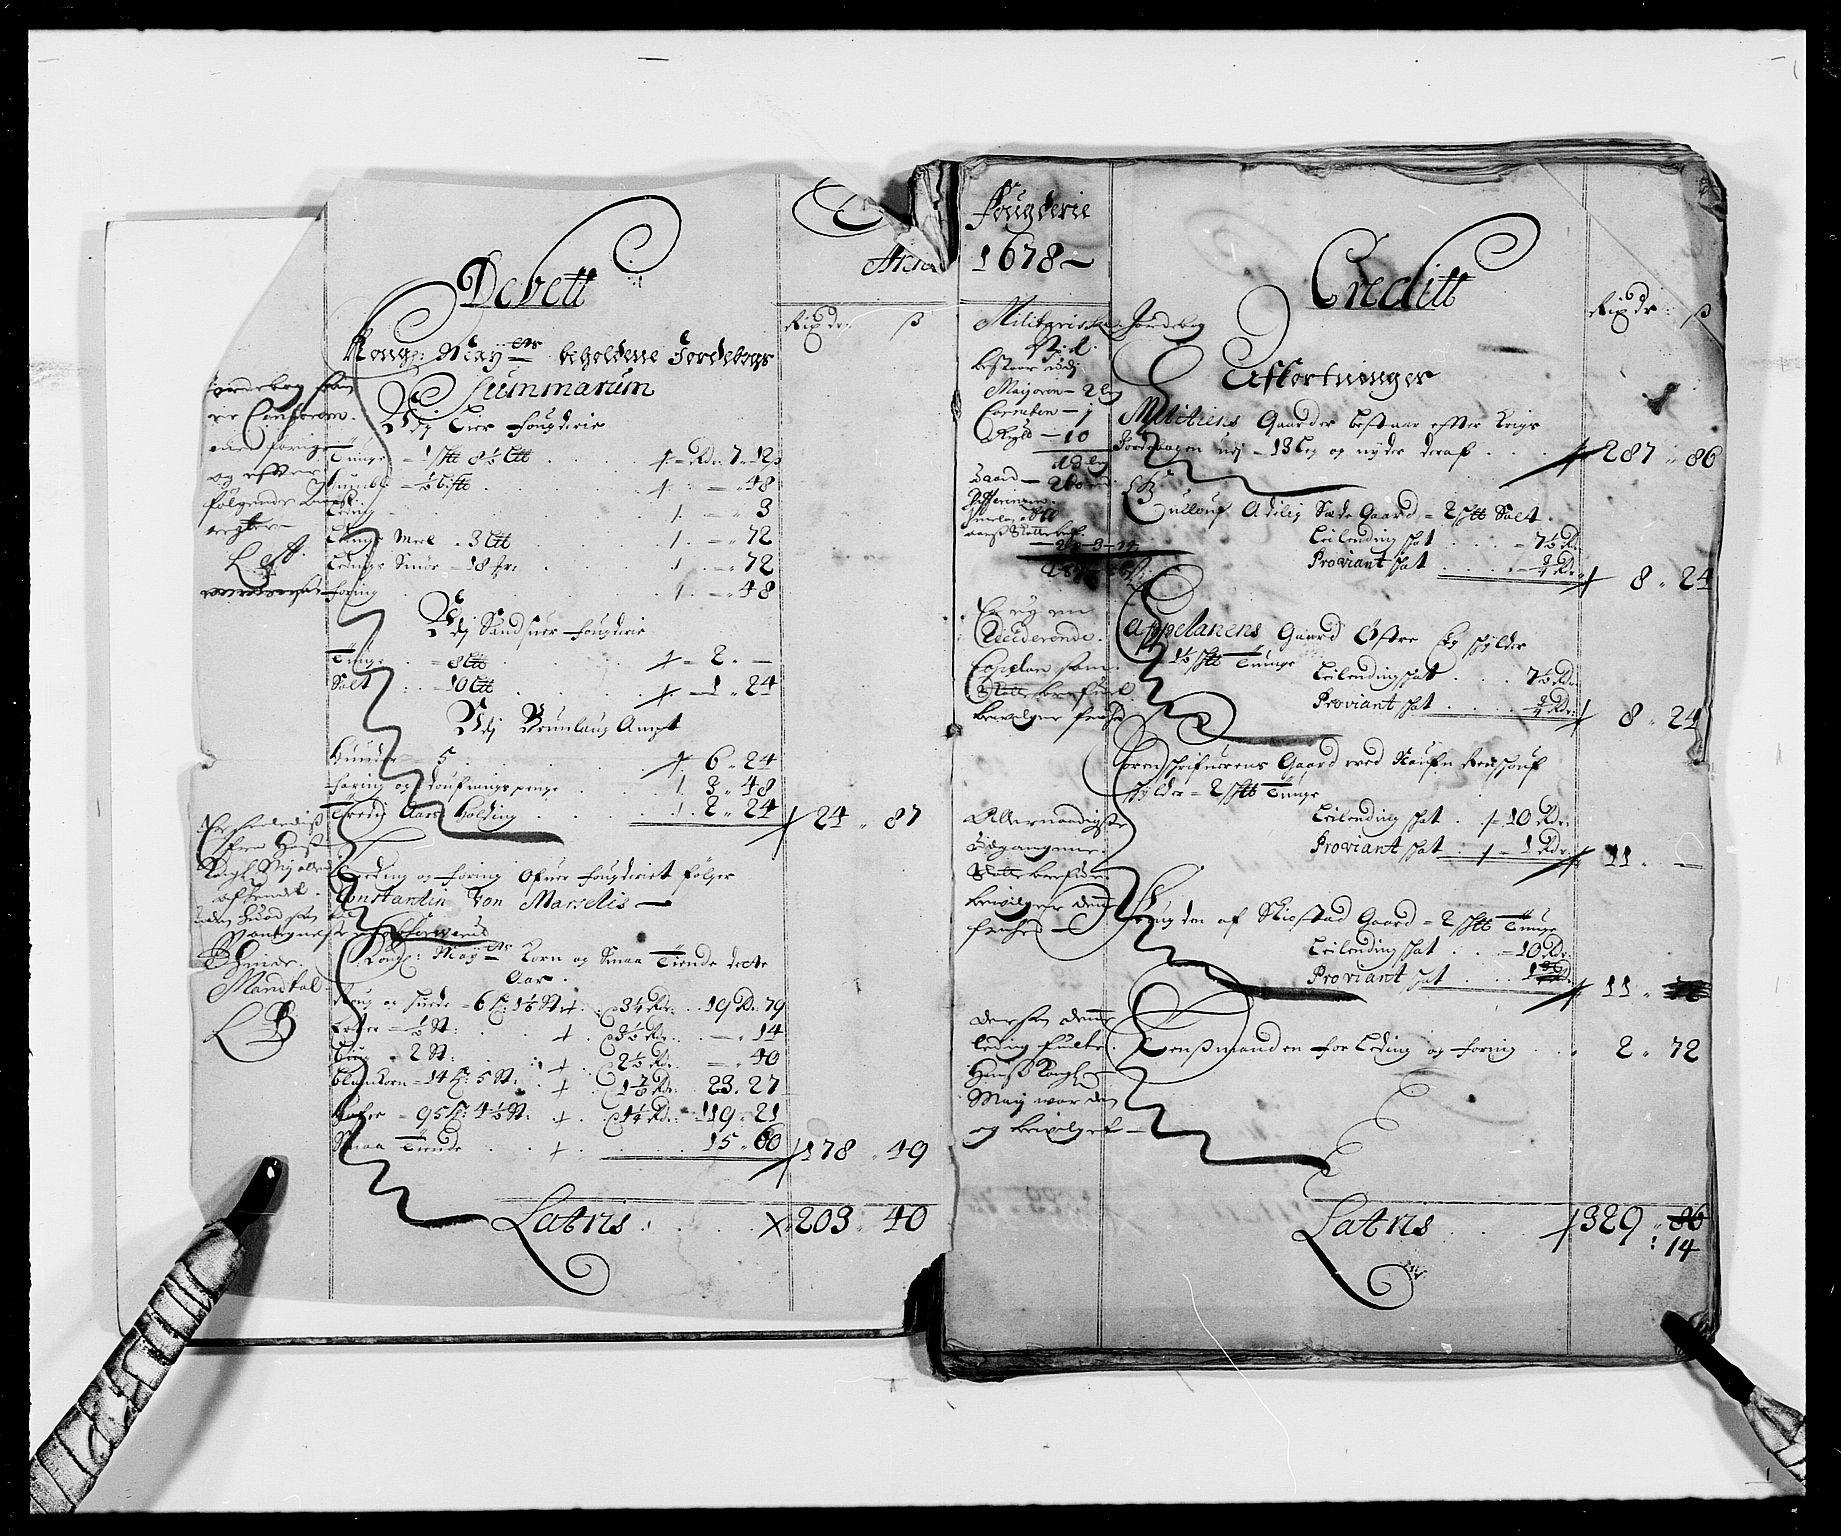 RA, Rentekammeret inntil 1814, Reviderte regnskaper, Fogderegnskap, R27/L1686: Fogderegnskap Lier, 1678-1686, s. 2